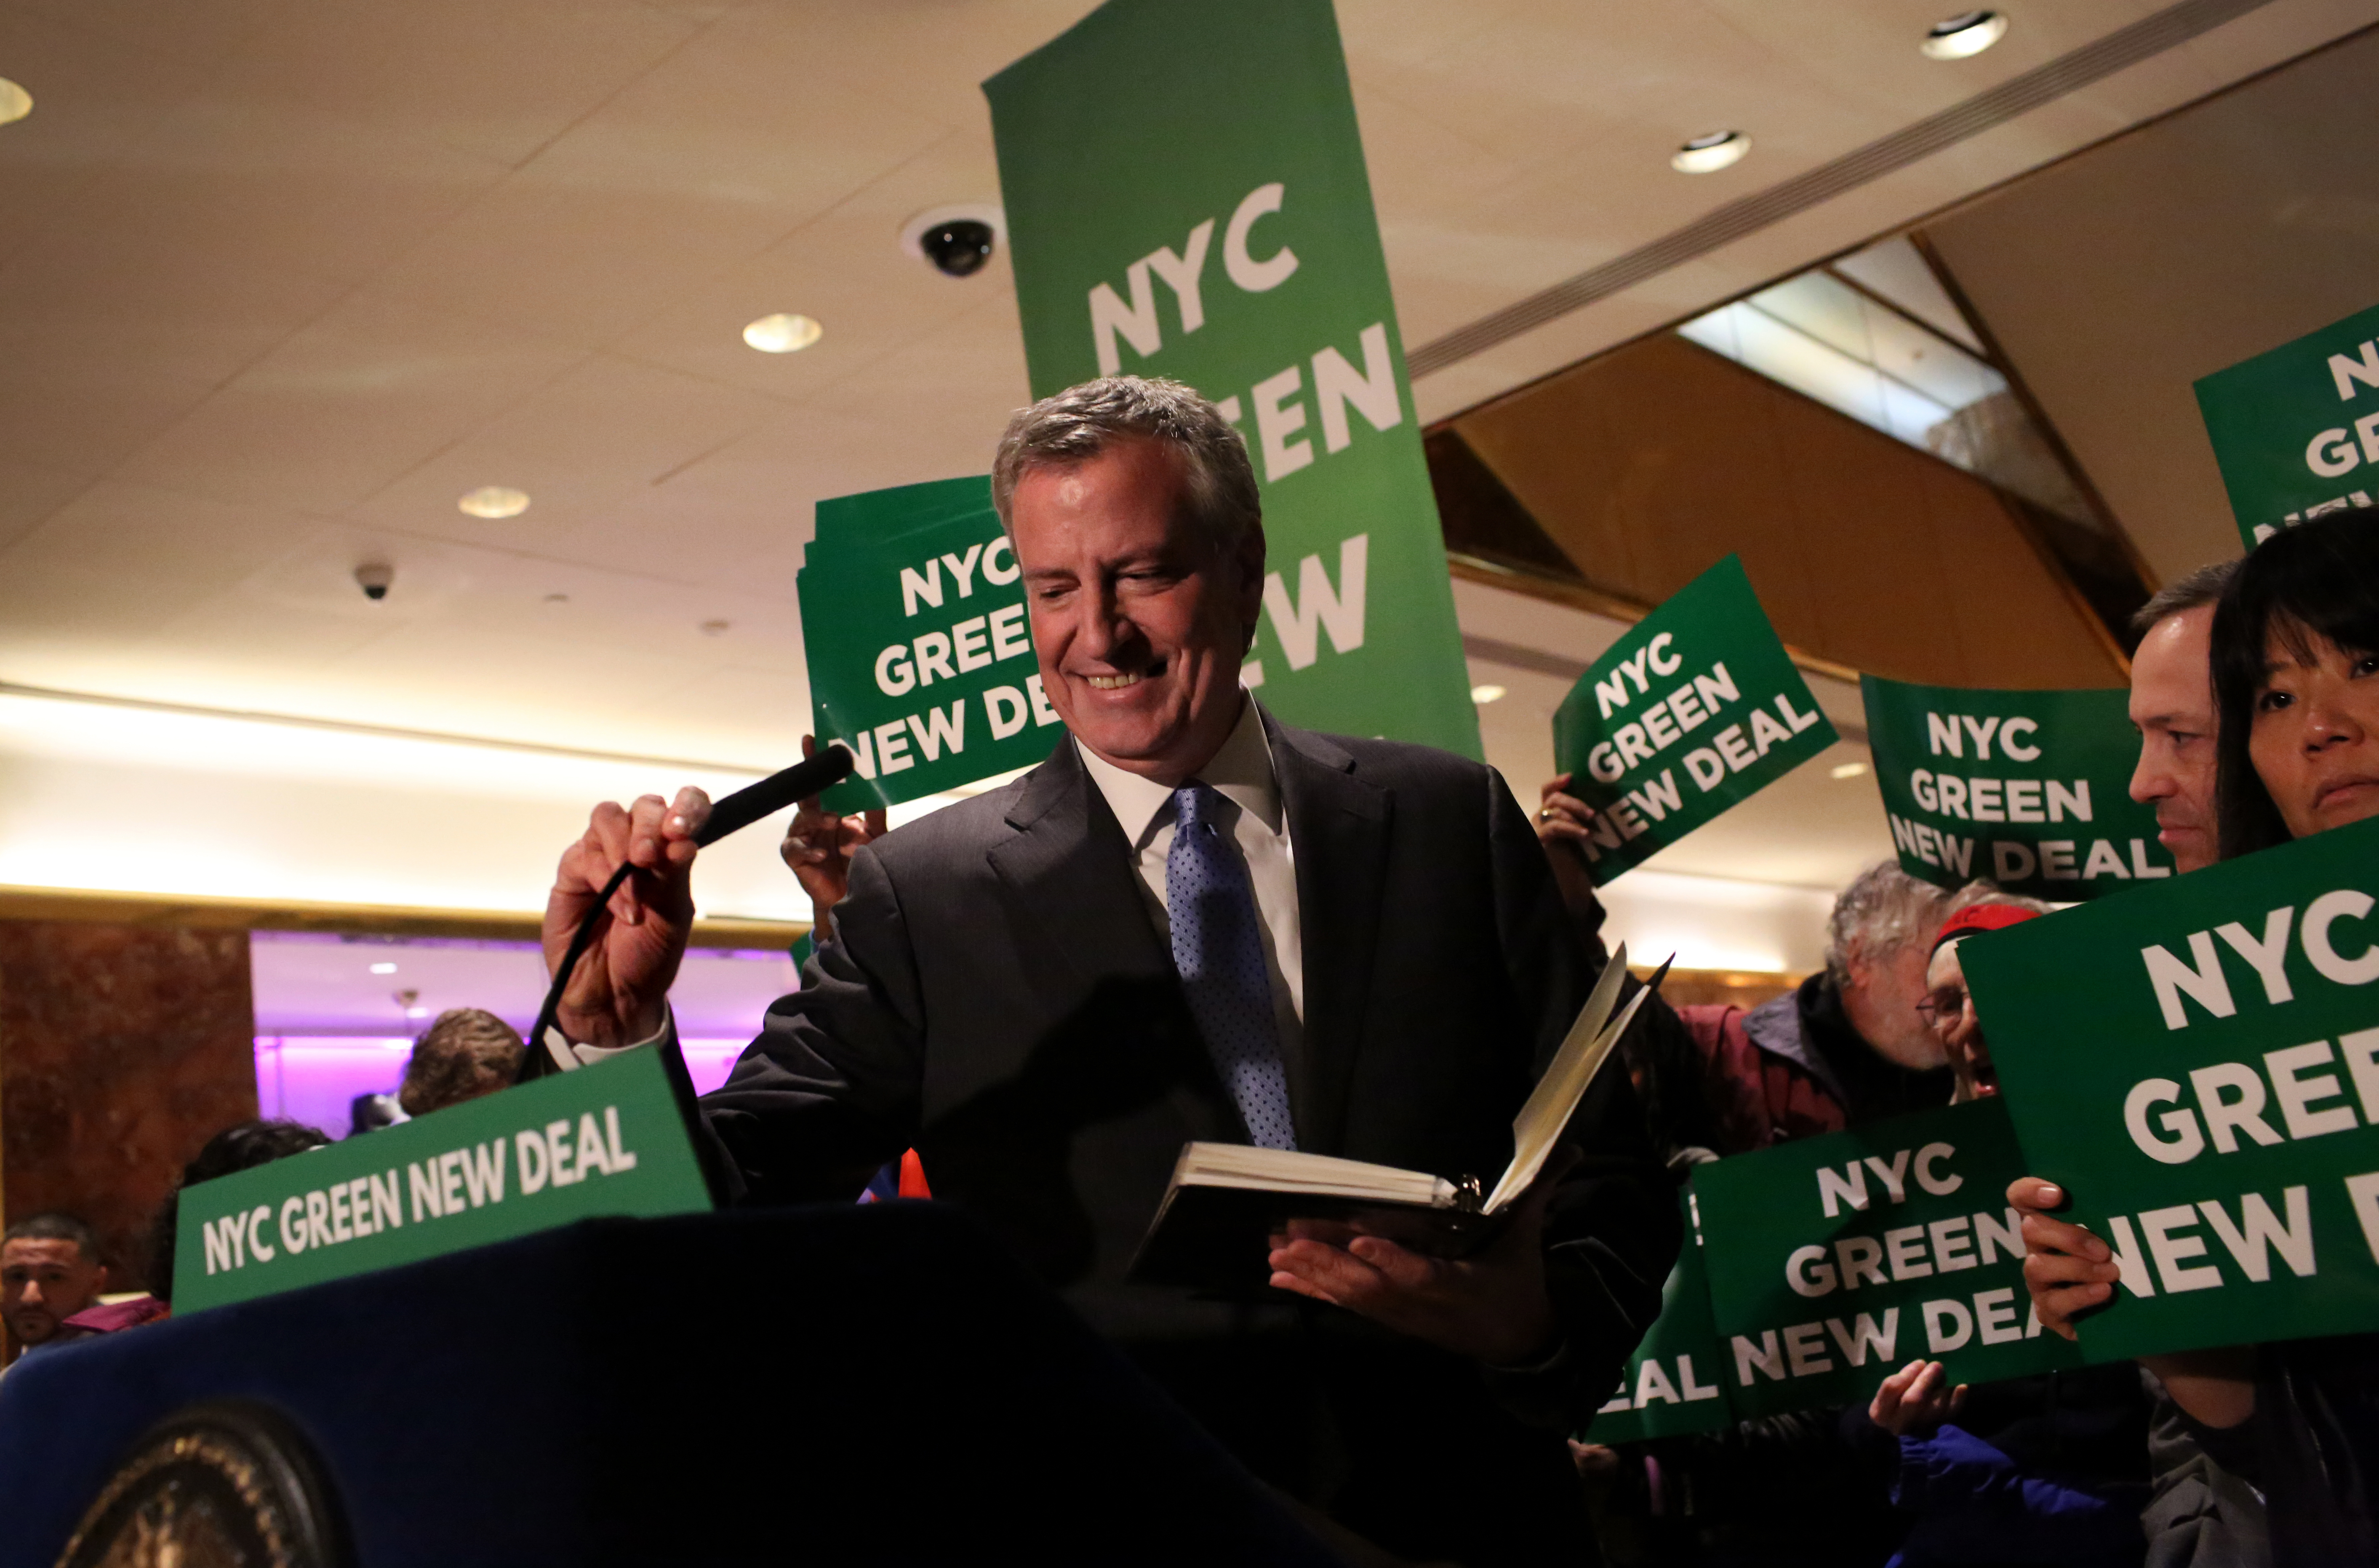 Mayor Bill De Blasio Holds Green New Deal Rally At Trump Tower